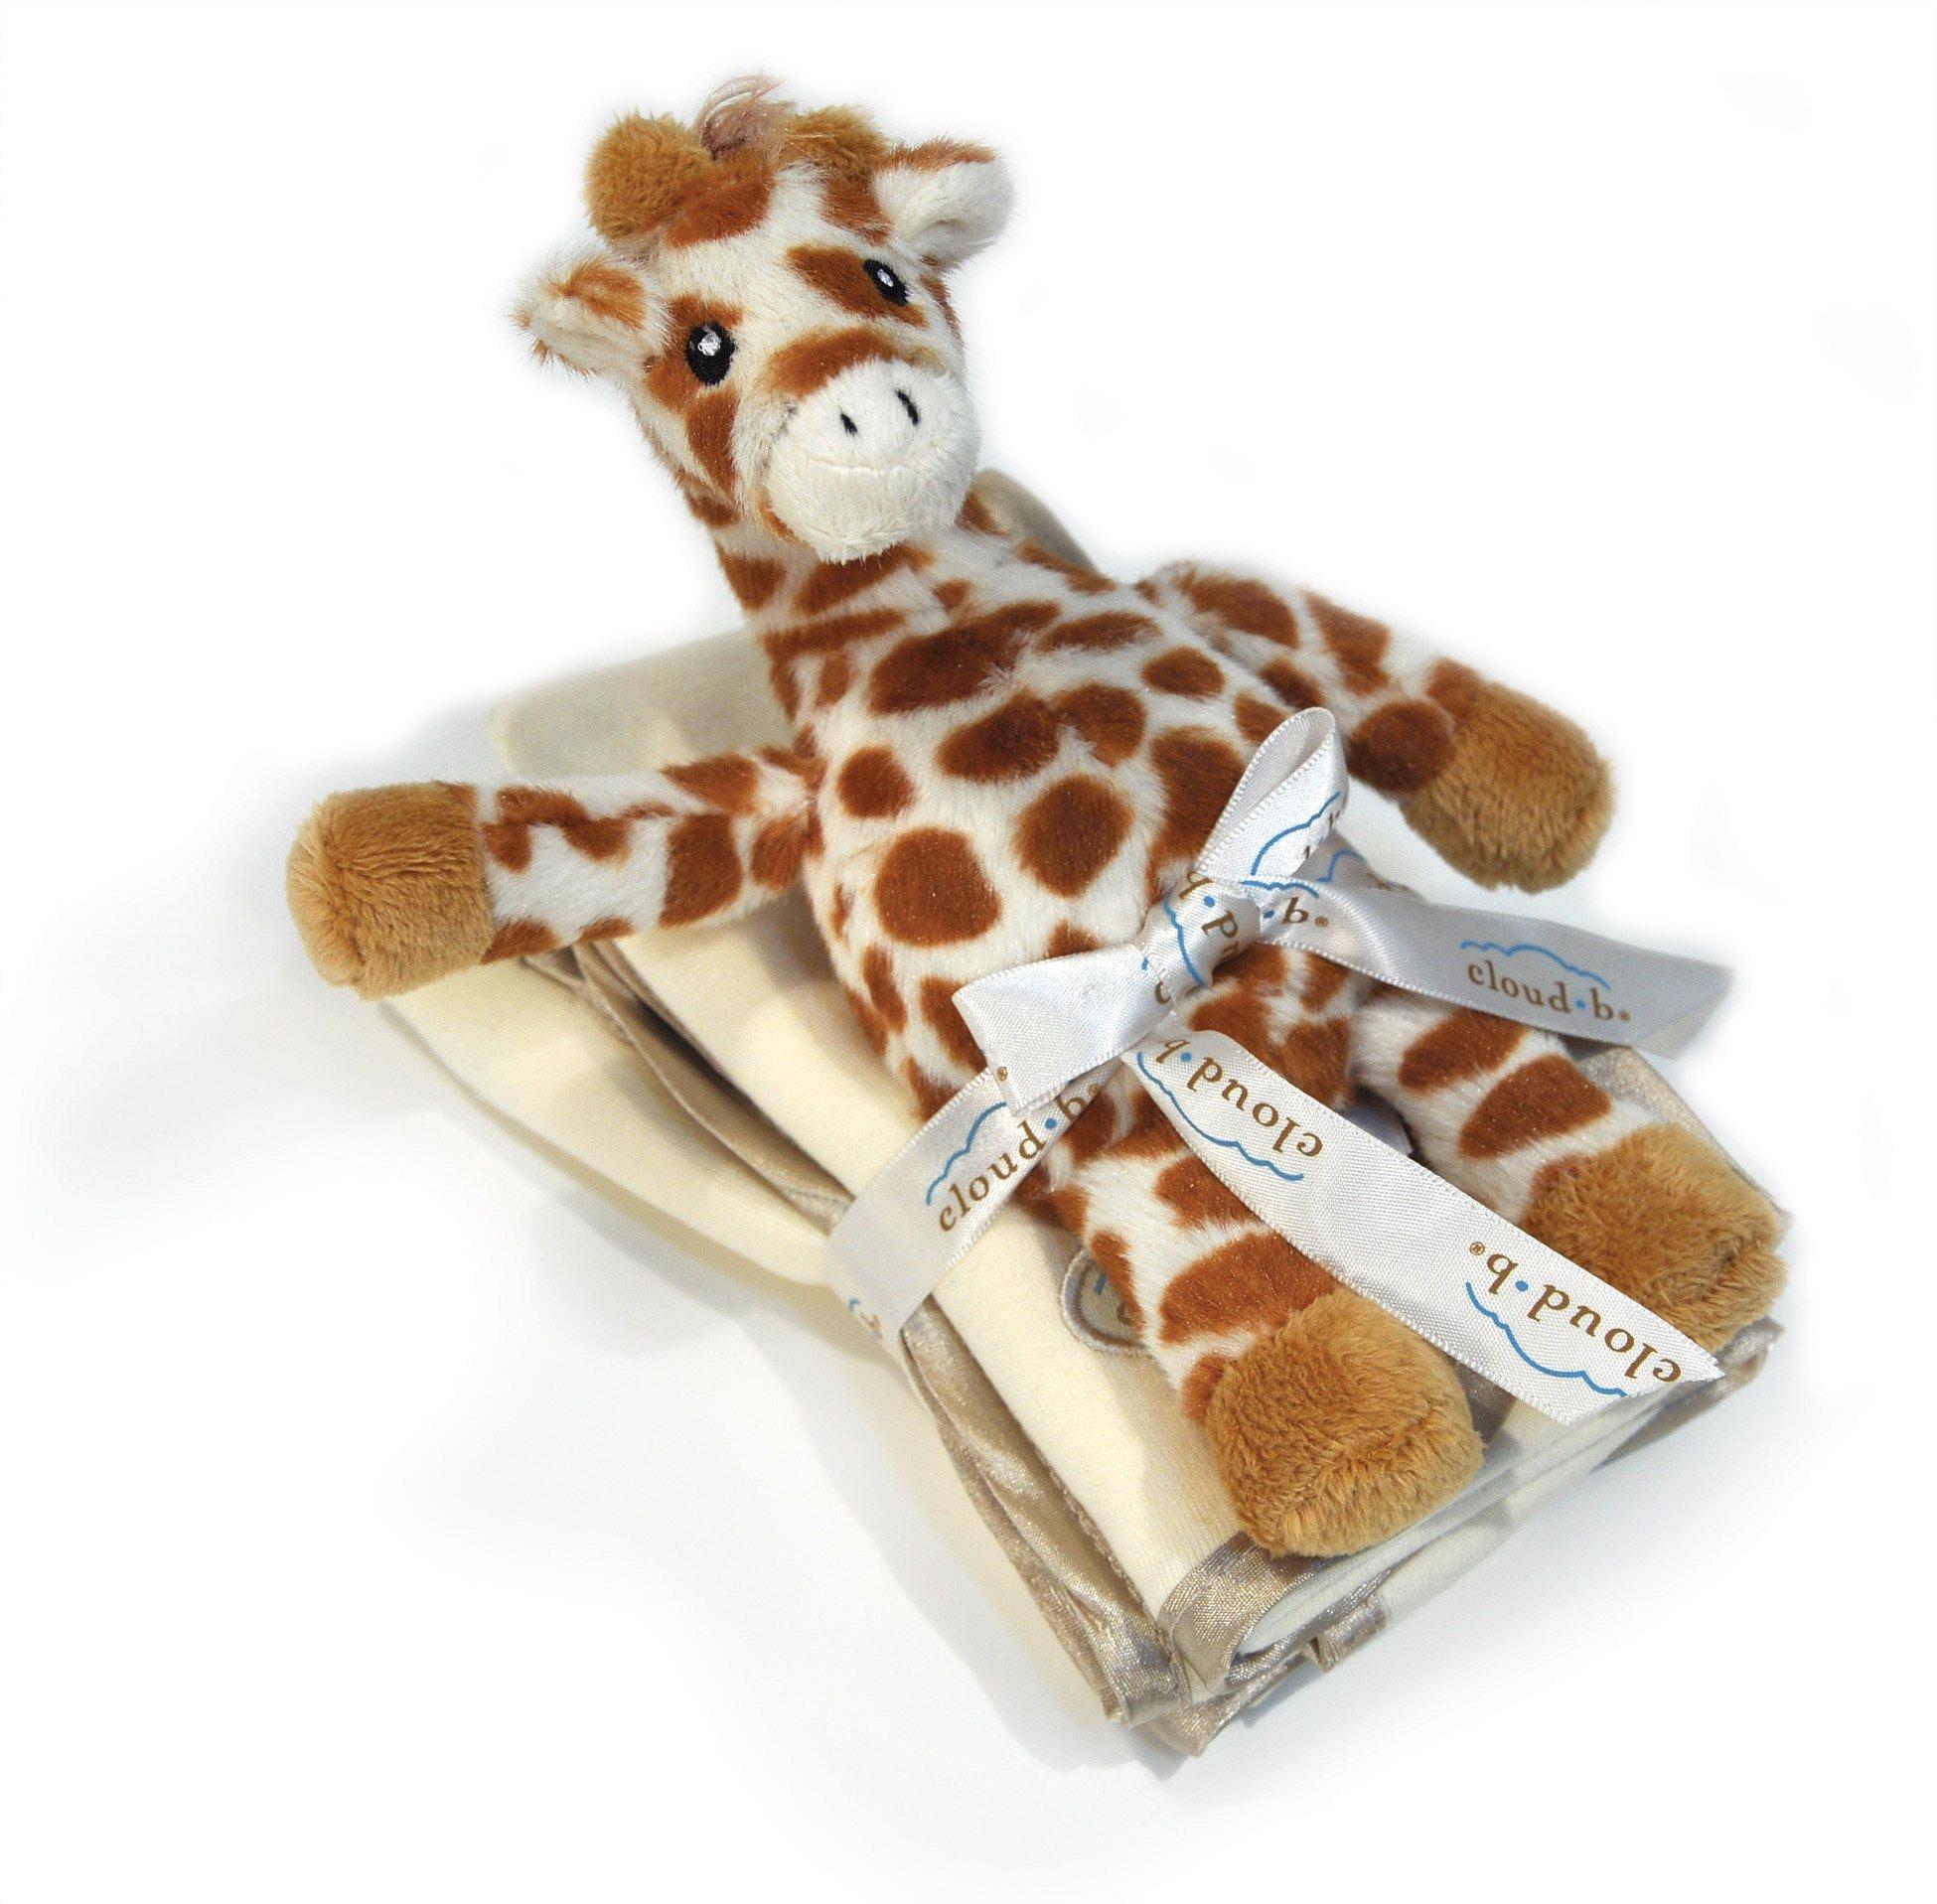 Cloud B Satin Trimmed 3 Pack of Burp Cloths with Giraffe Rattle